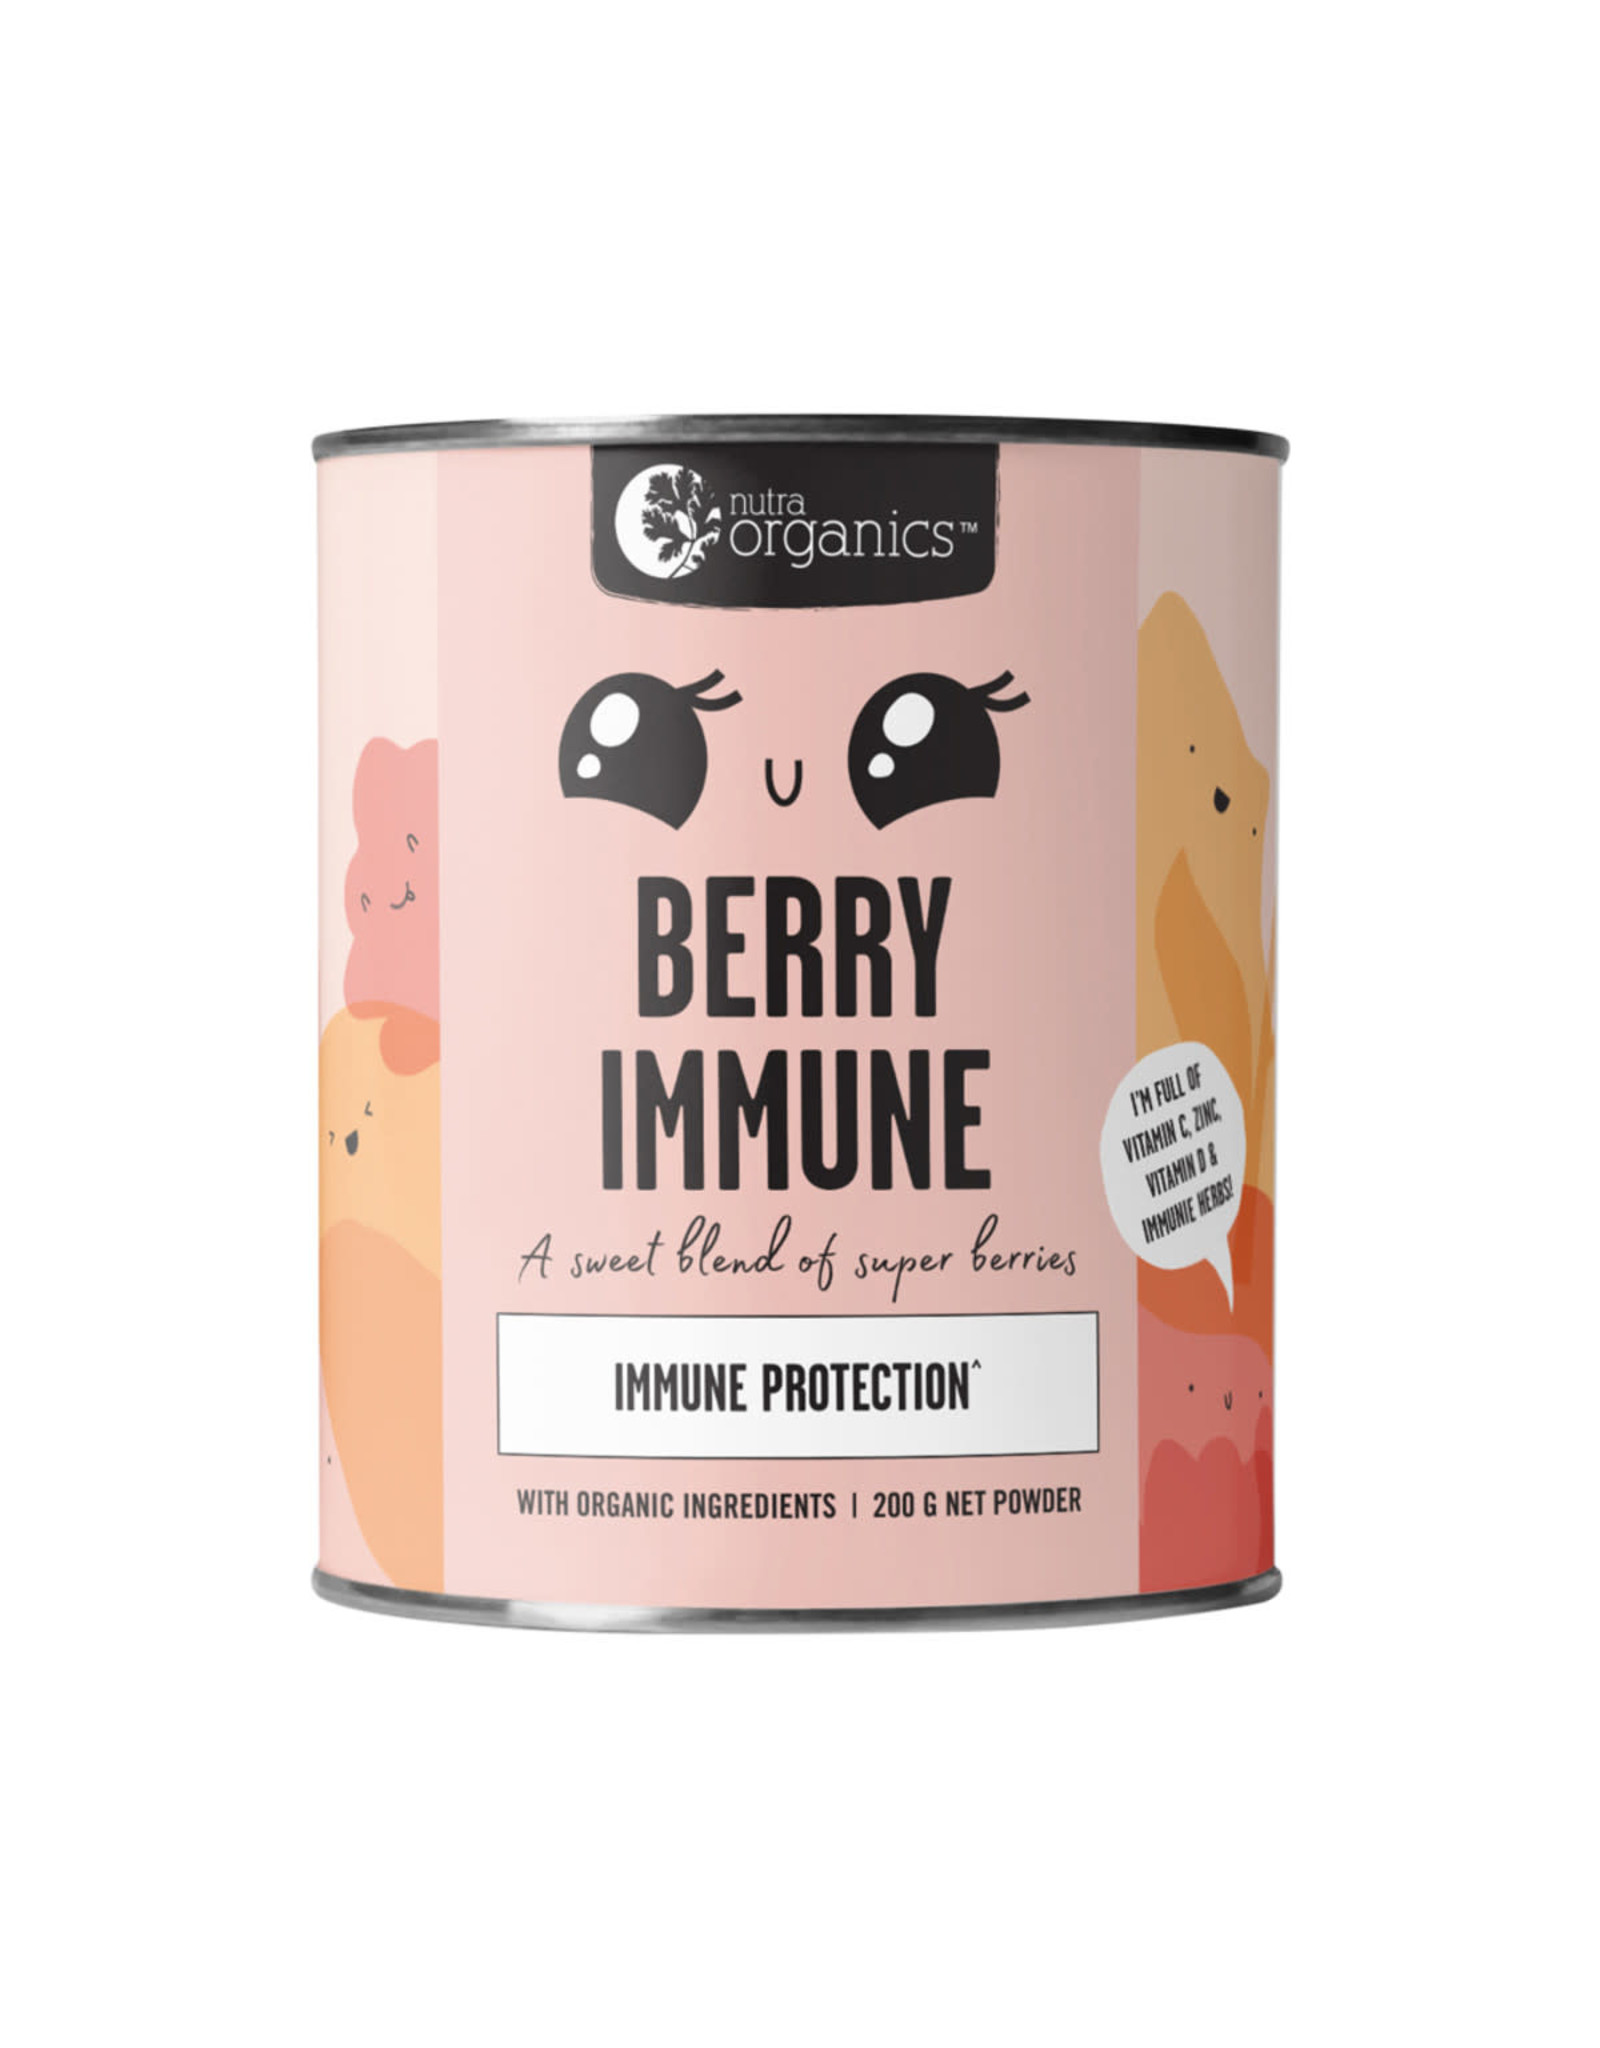 NutraOrganics Berry Immune (Immune Protection)